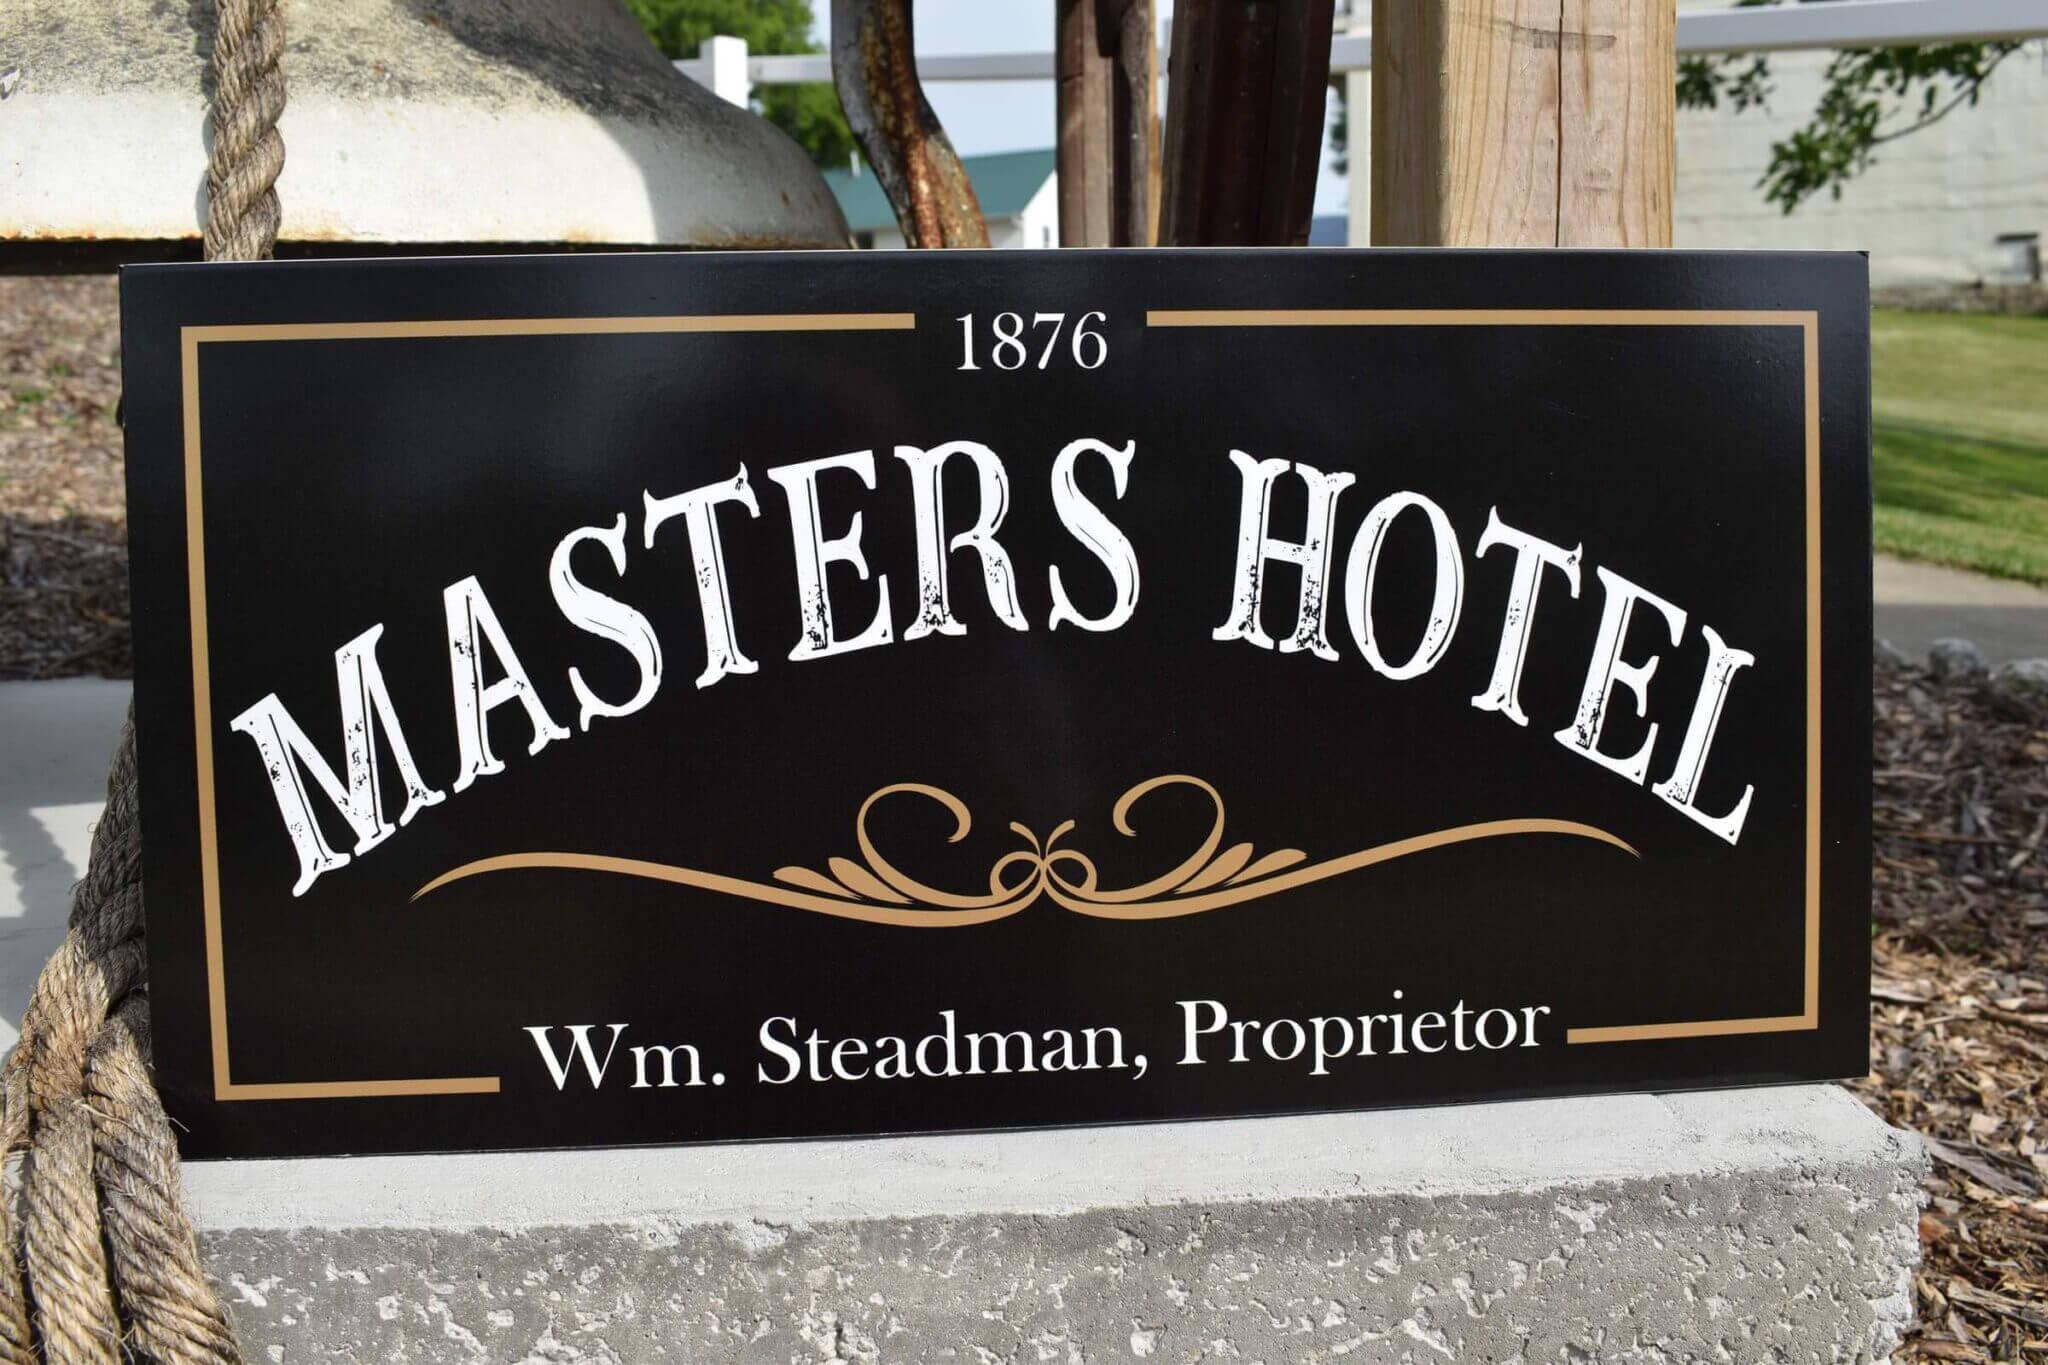 1876 Masters Hotel Wm. Steadman, Proprietor